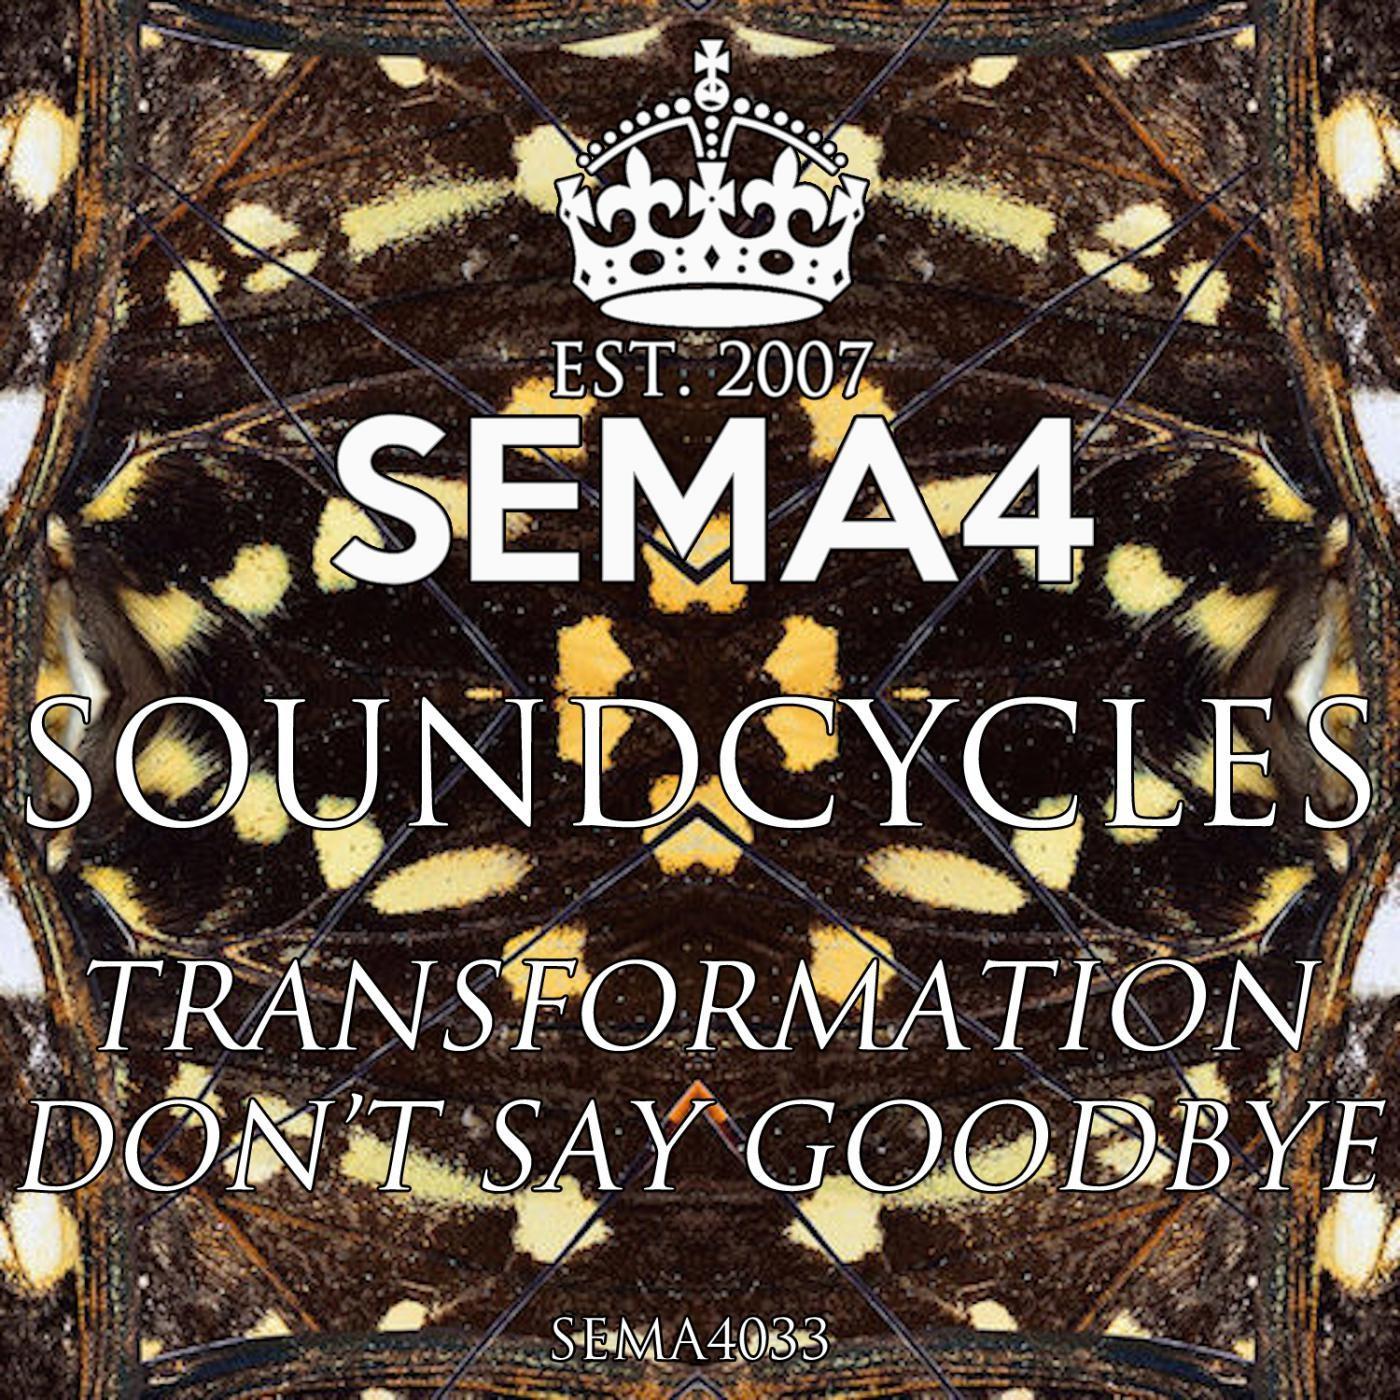 SoundCycles - Transformation (Original Mix)